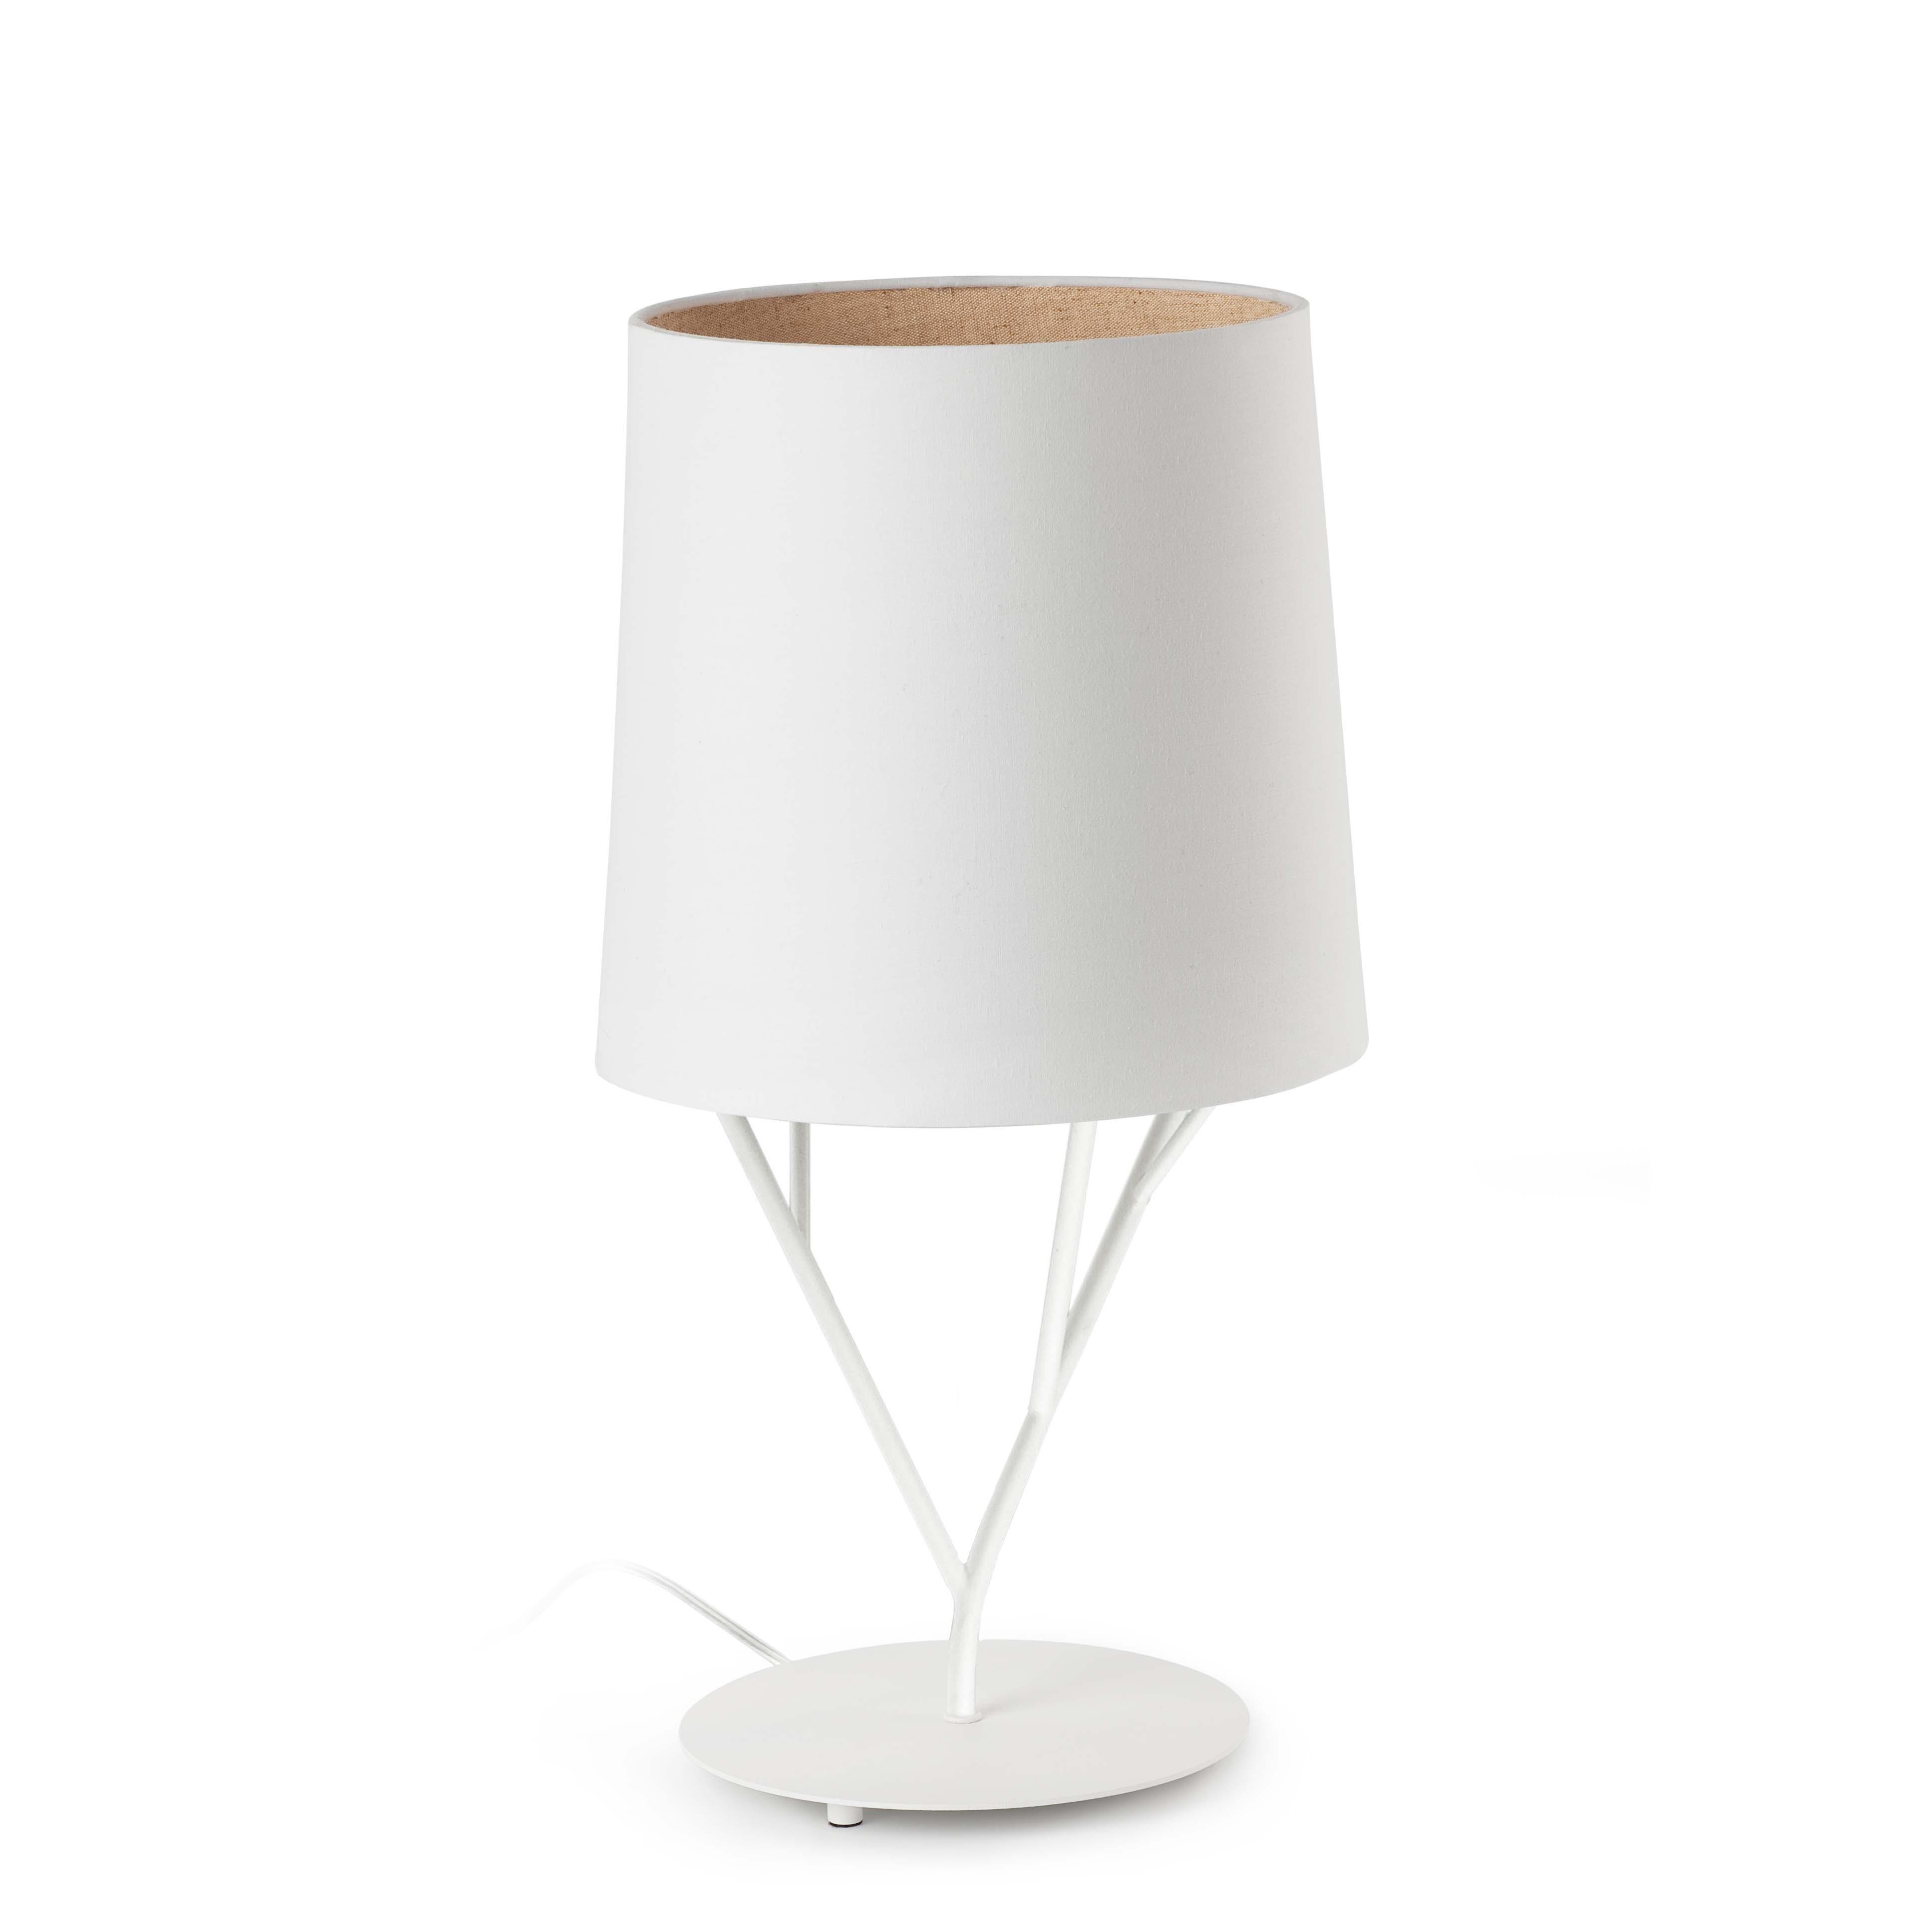 Faro tree table lamp 1l e27 60w white 29867 lmparas de diseo imagen 1 de tree table lamp 1l e27 60w white mozeypictures Images